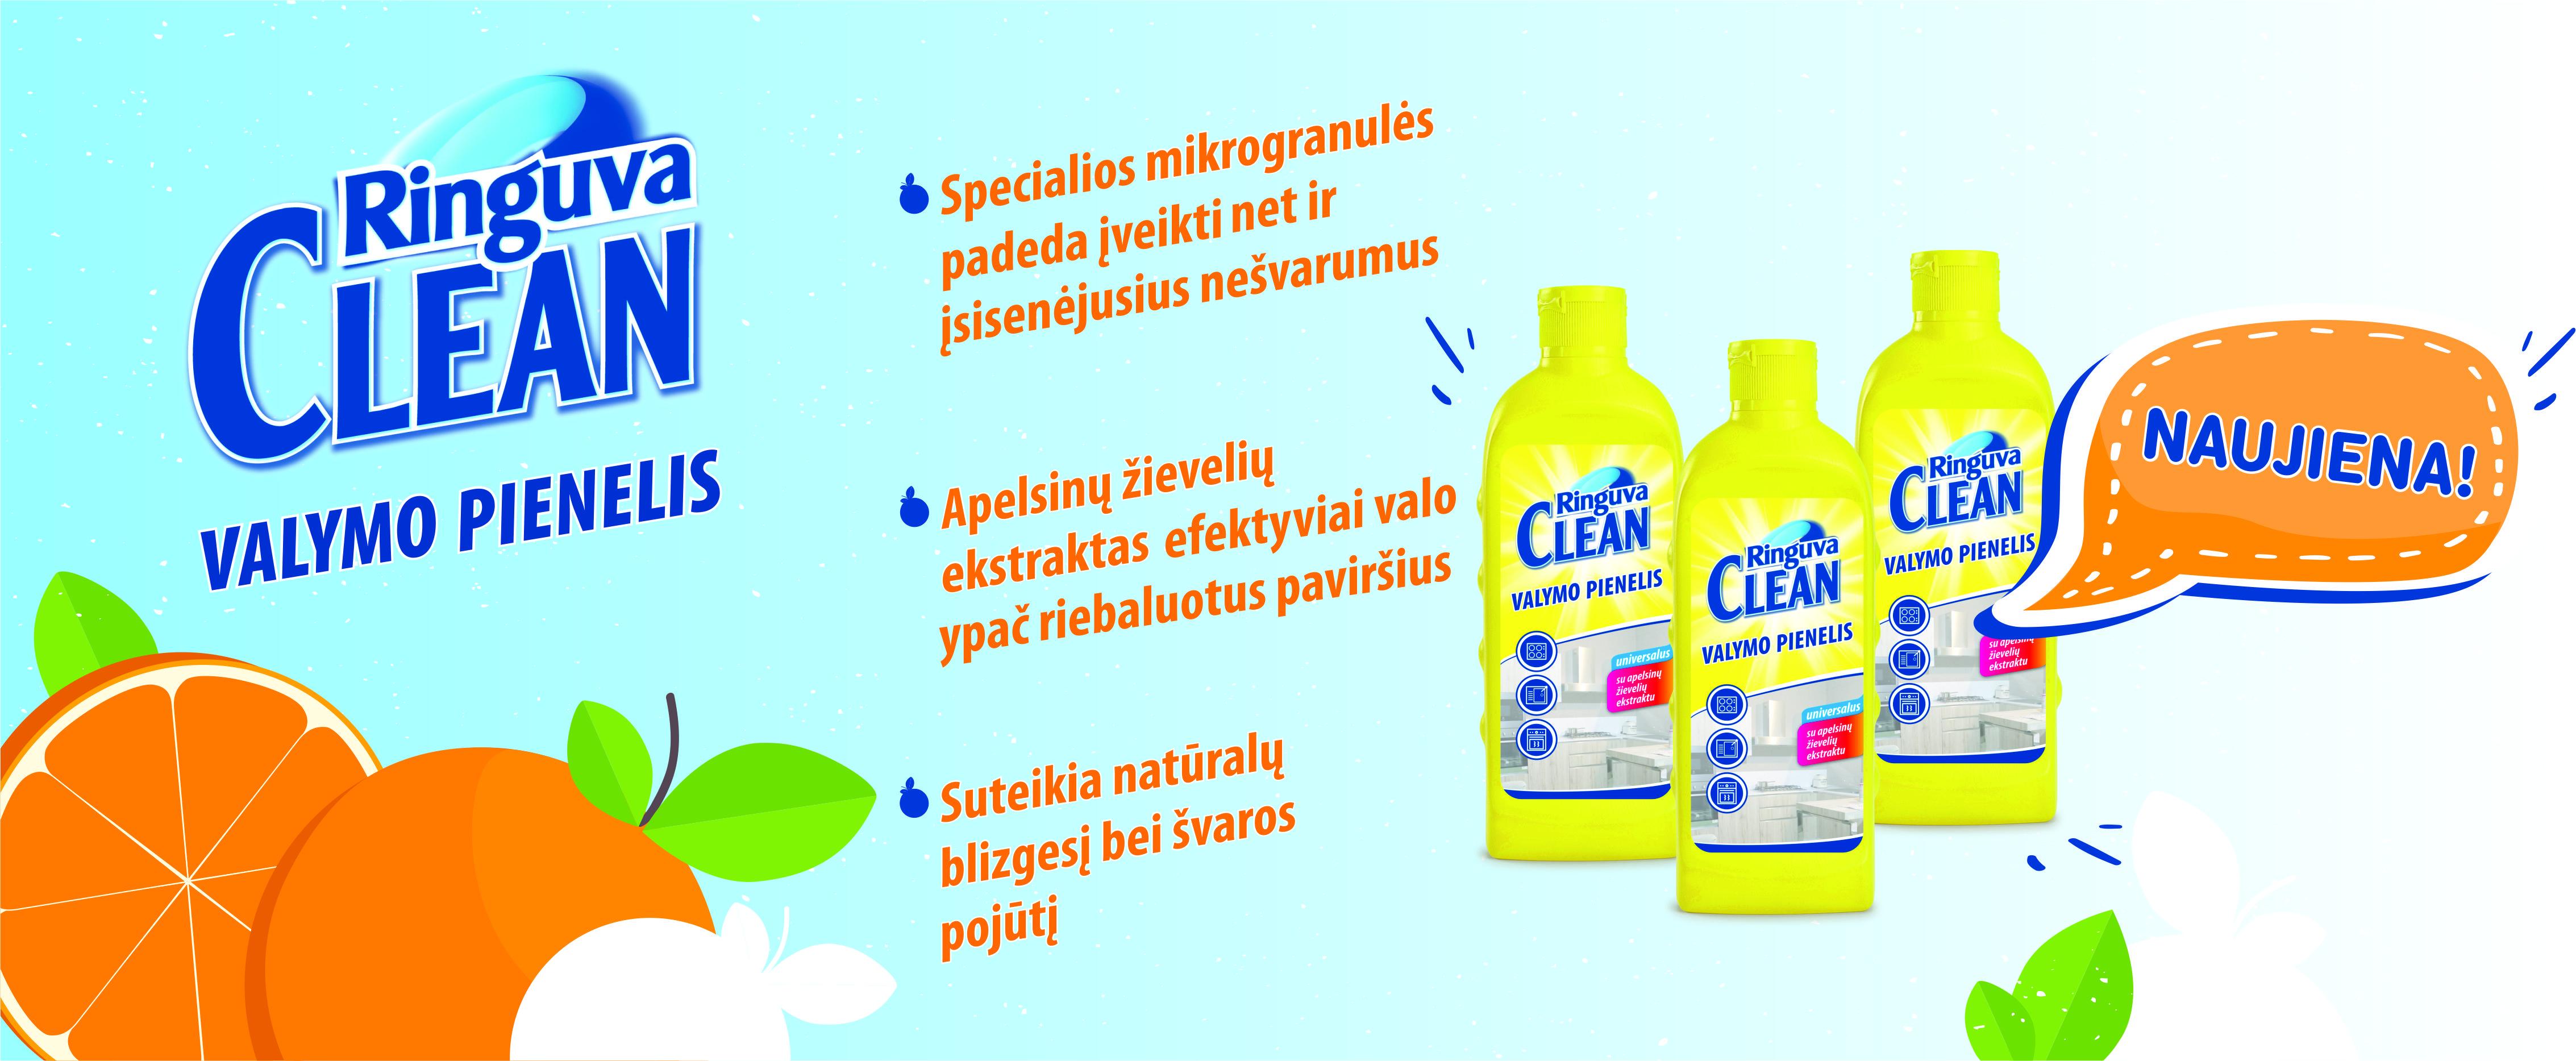 Ringuva Clean valymo pienelis